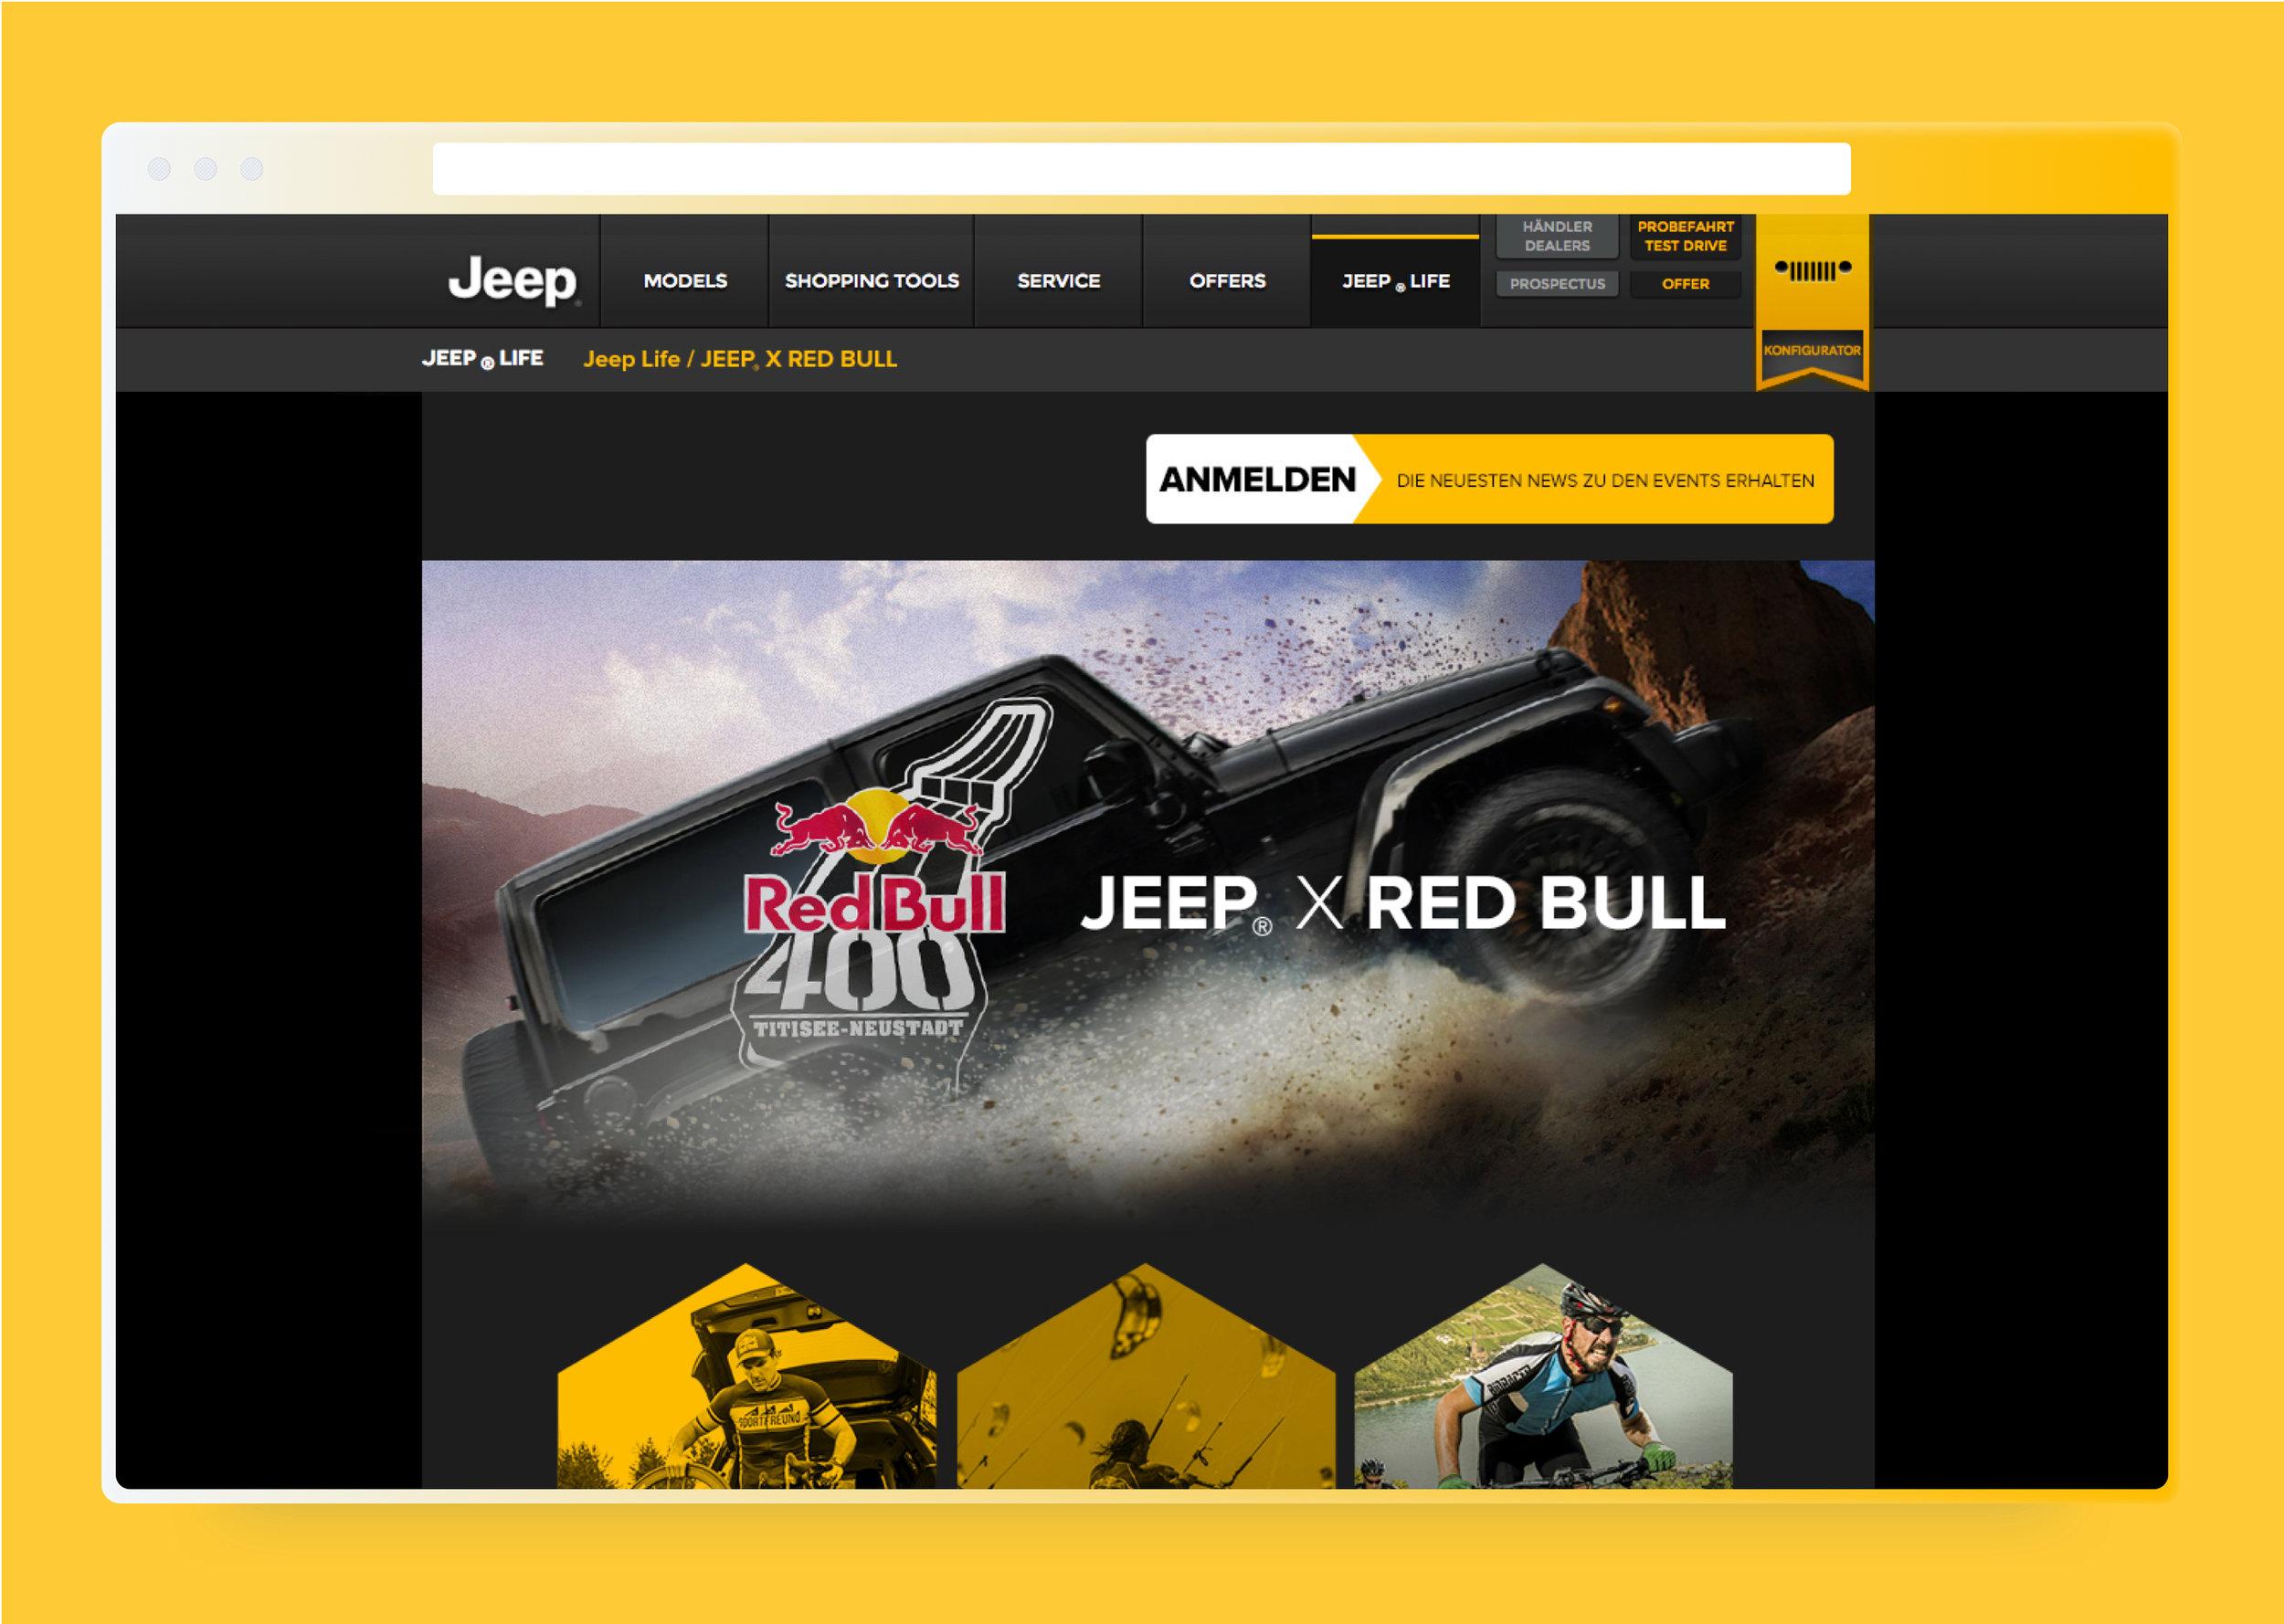 jeep-Browser-Mockup.jpg